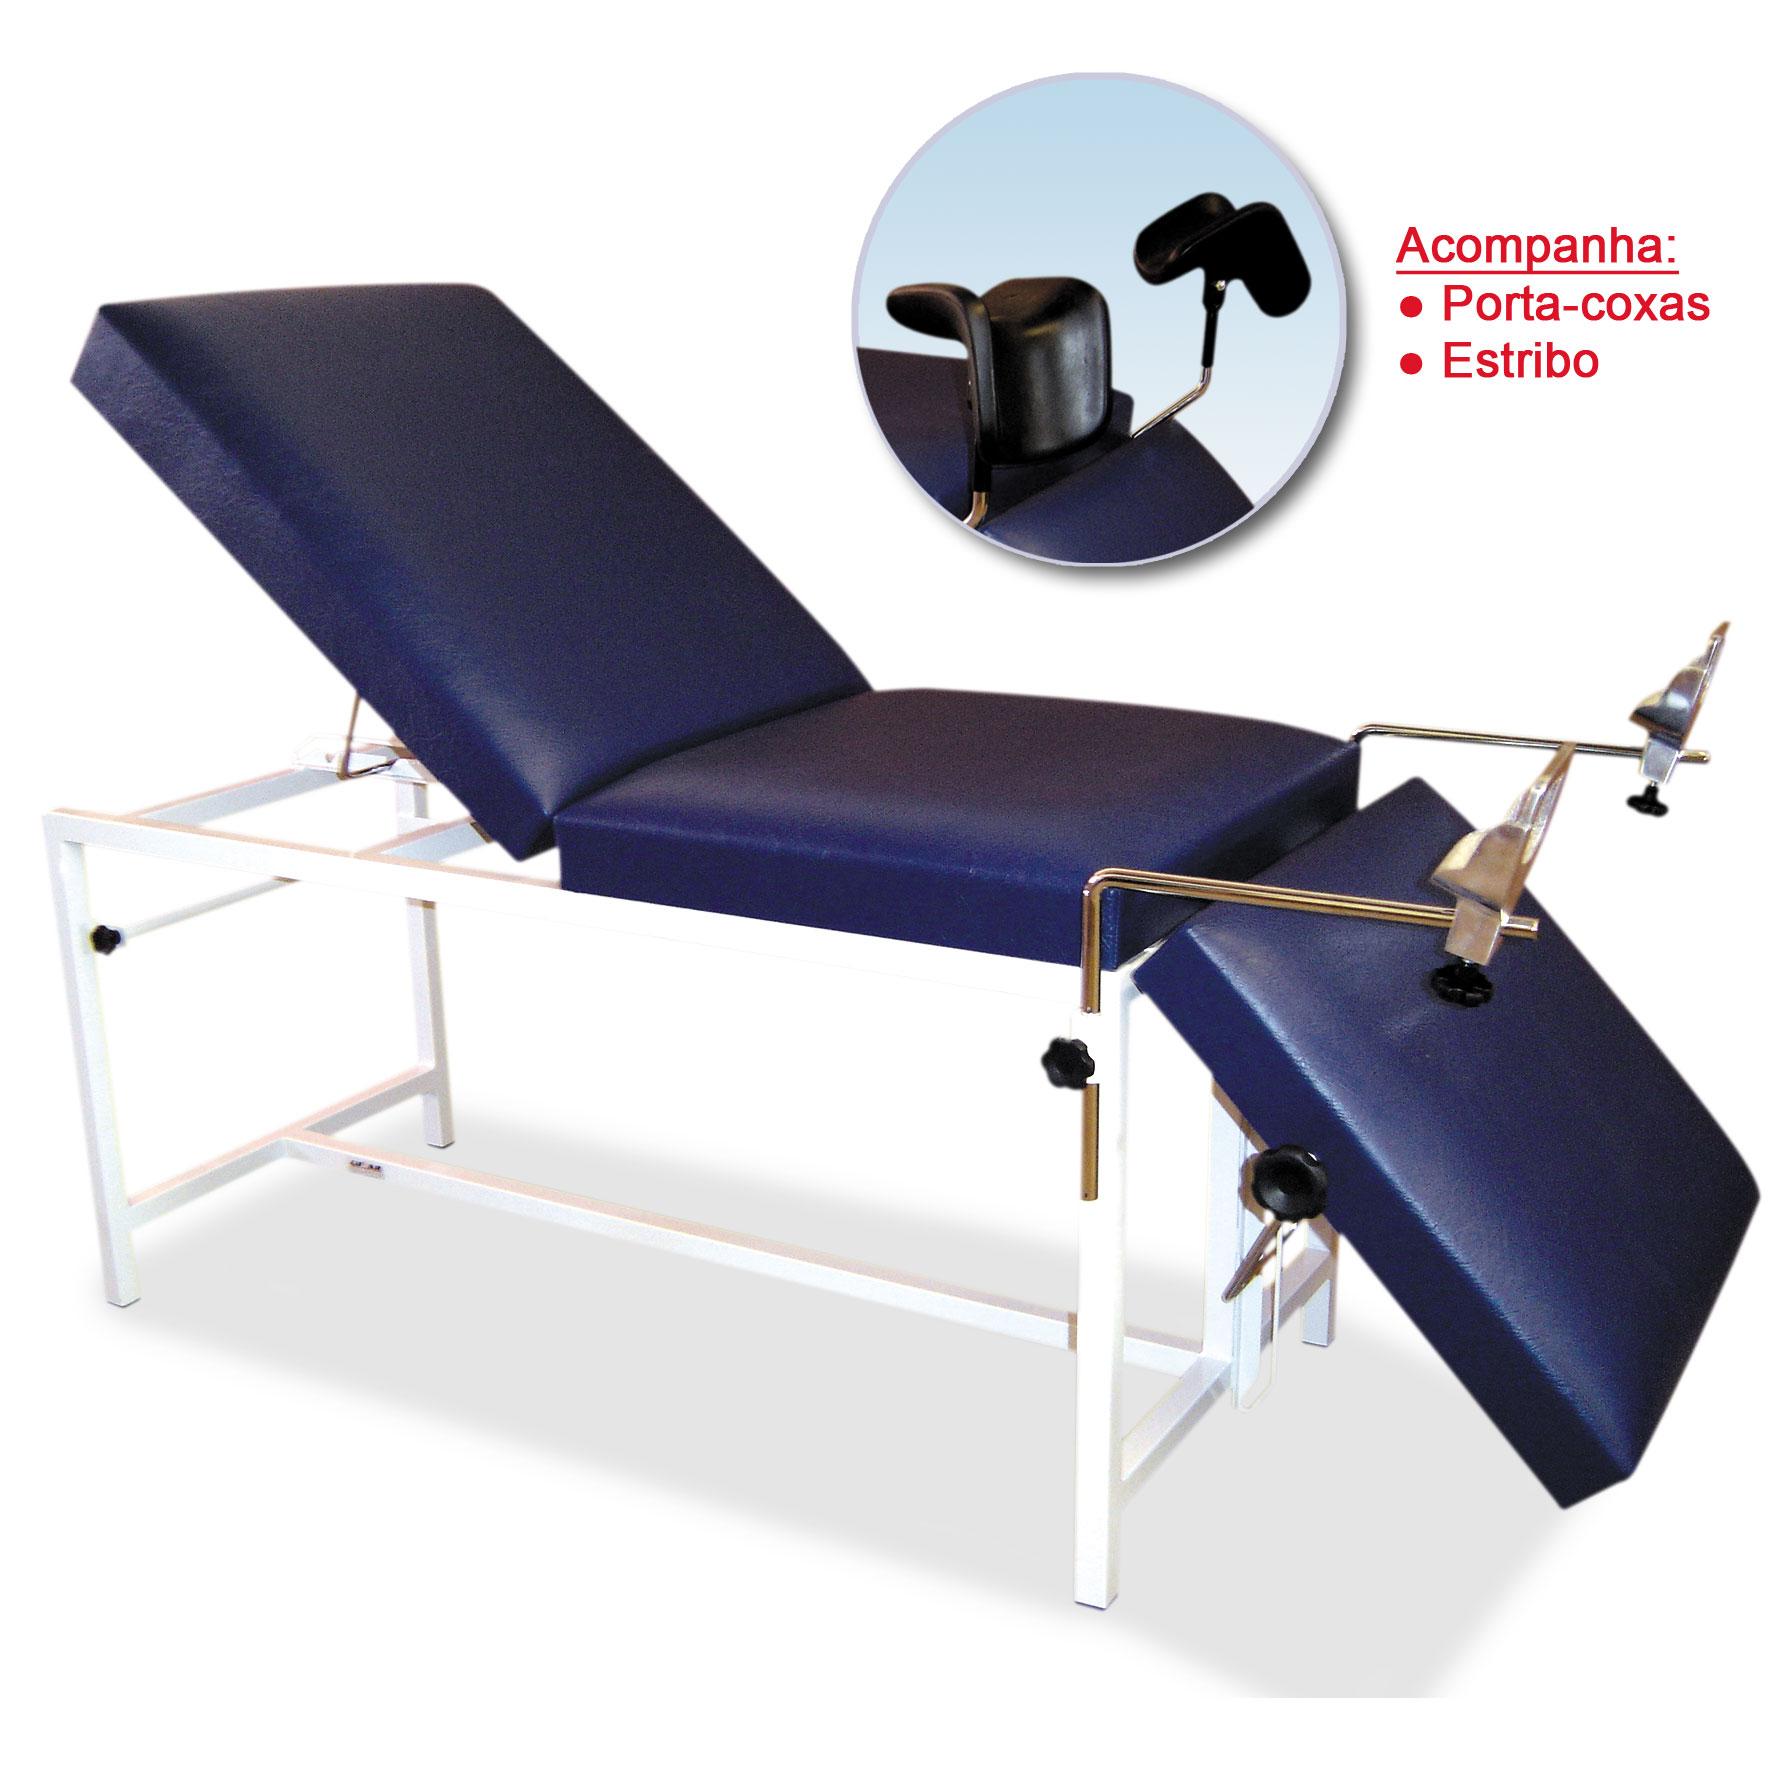 Mesa para exames ultrassom